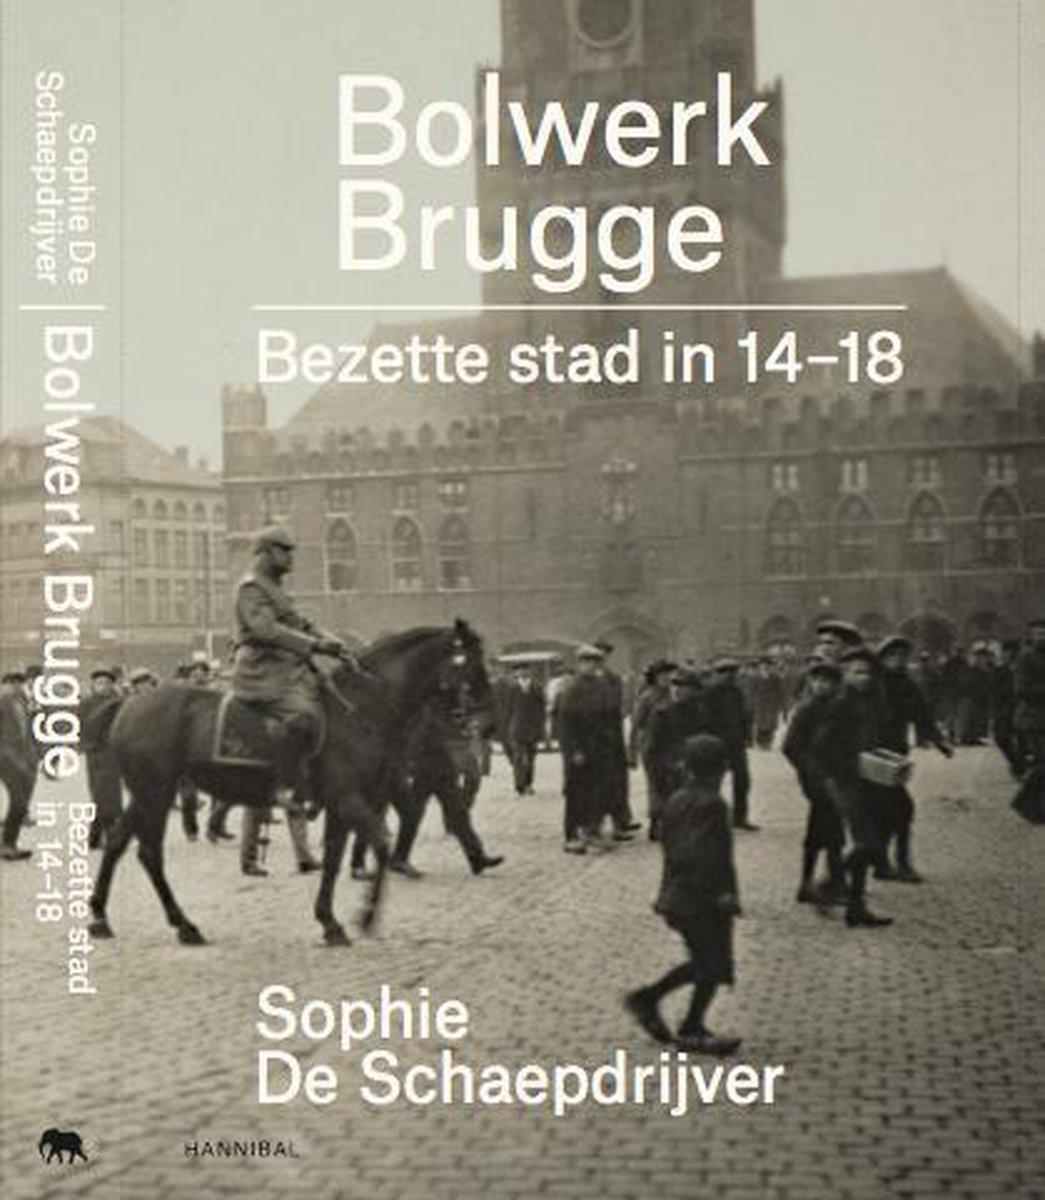 Sophie De Schaepdrijver,Bulwork bruges